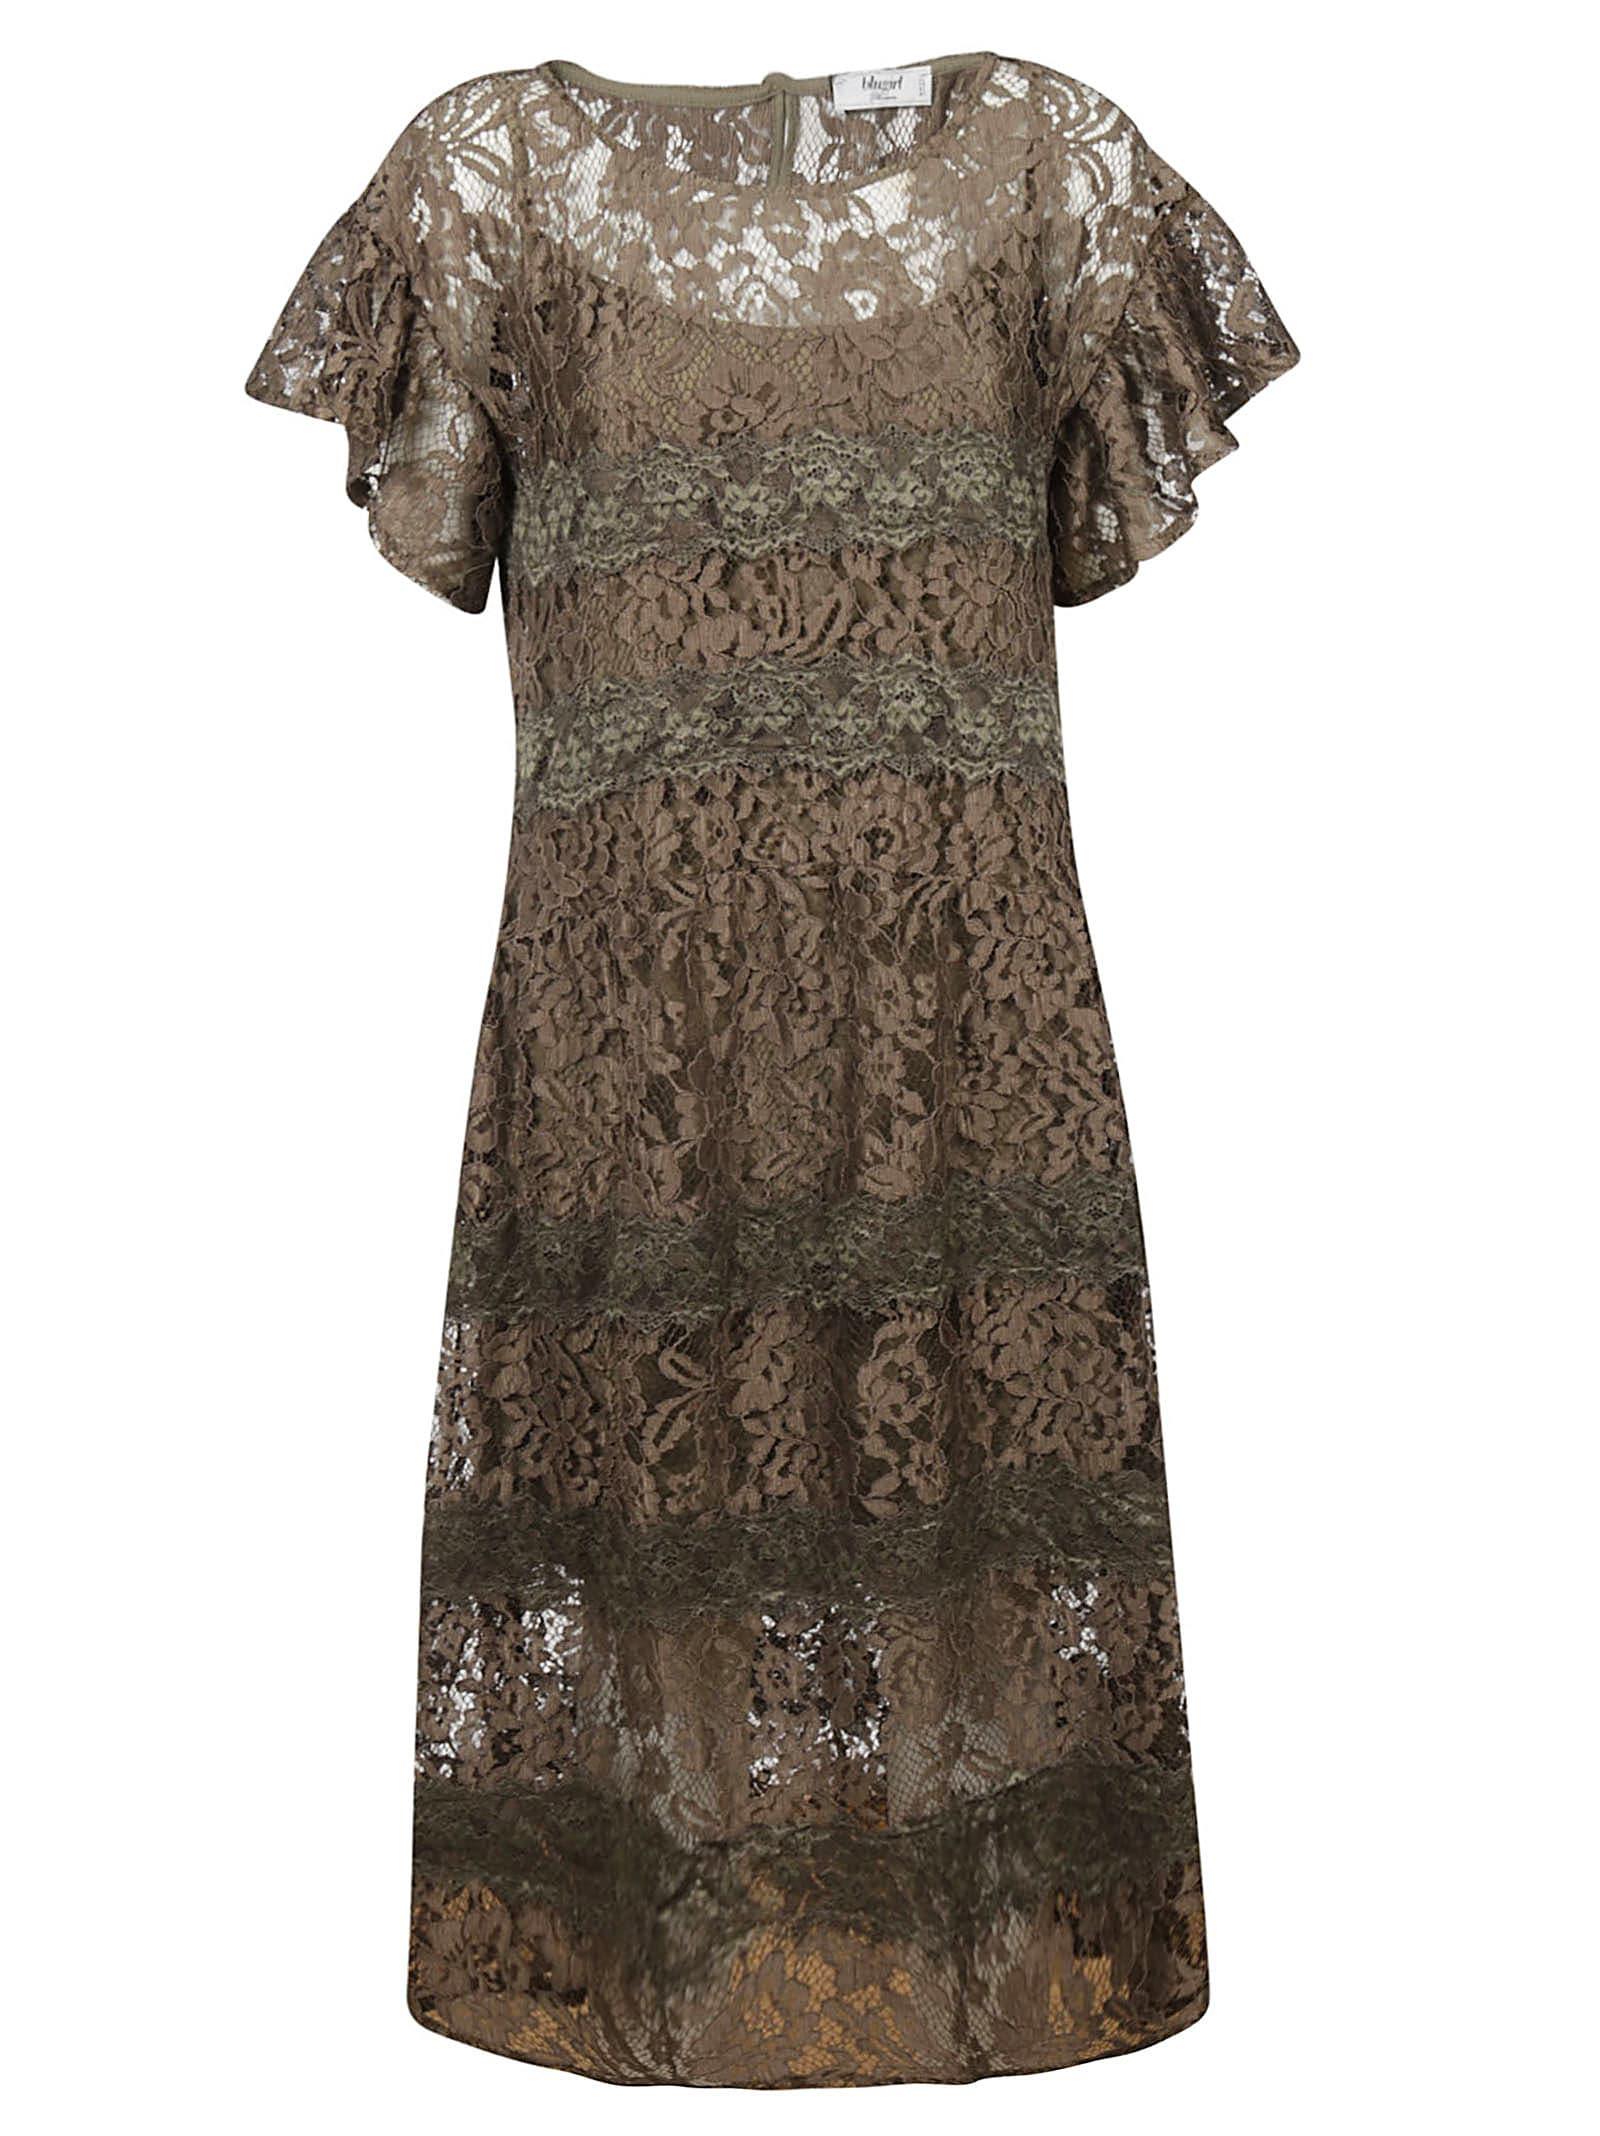 Blugirl Perforated Floral Dress